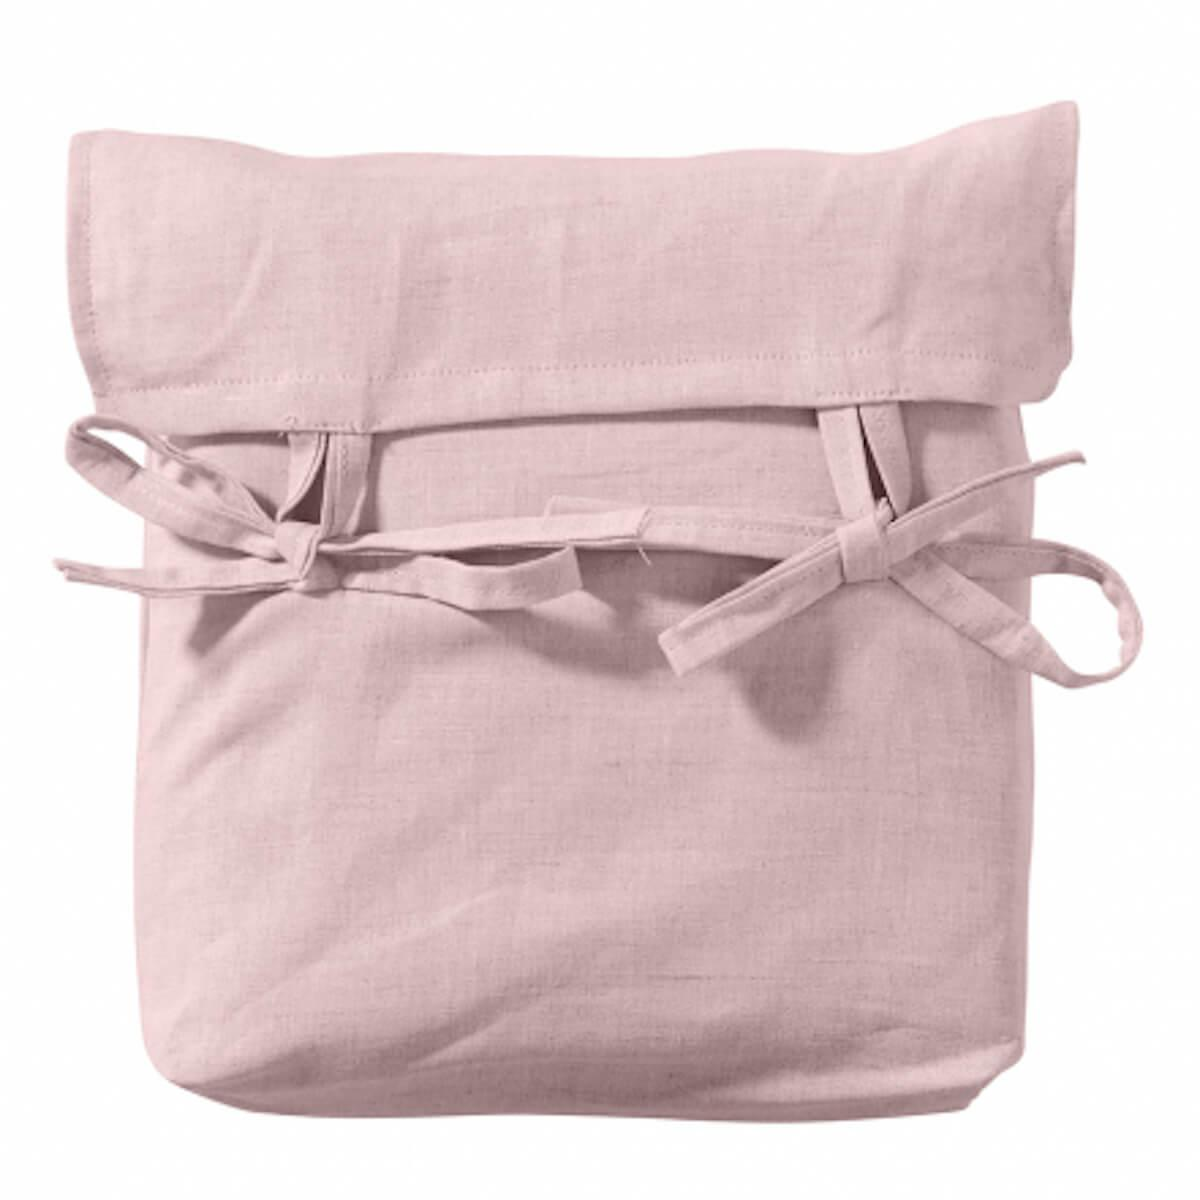 Cortinas cama alta/semi-alta SEASIDE CLASSIC Oliver Furniture rosa